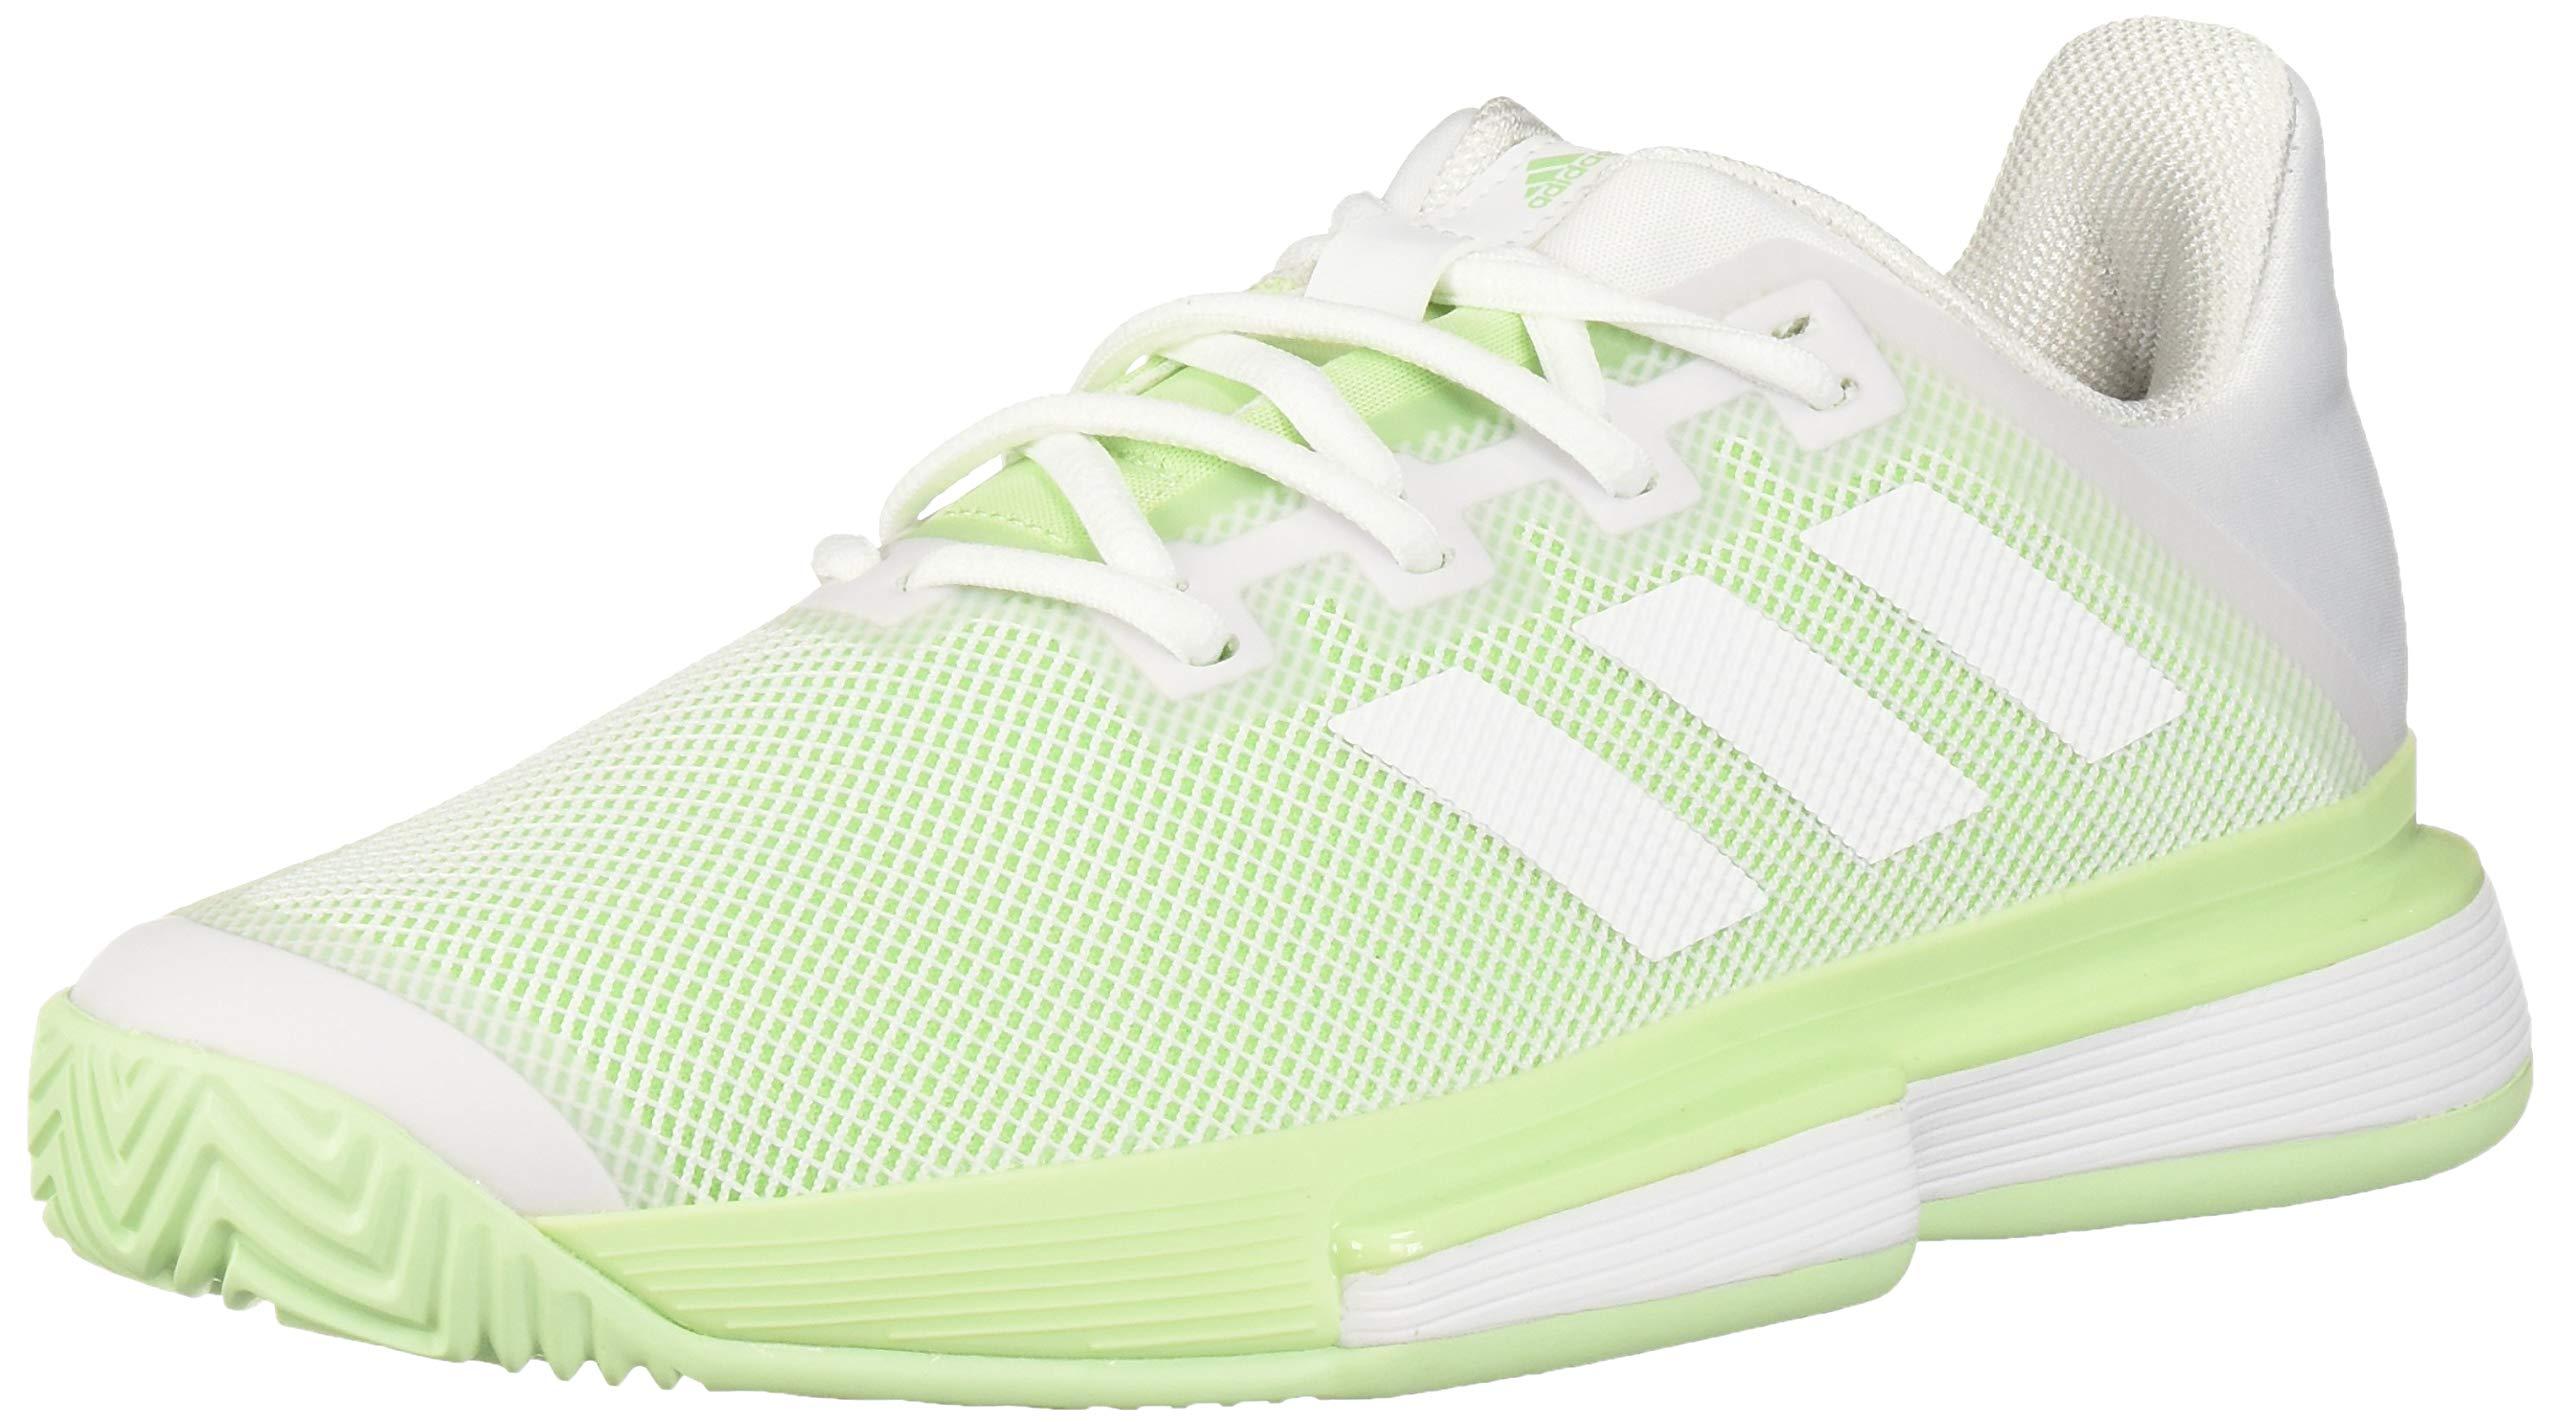 adidas Women's SoleMatch Bounce Tennis Shoe, White/Glow Green, 5 M US